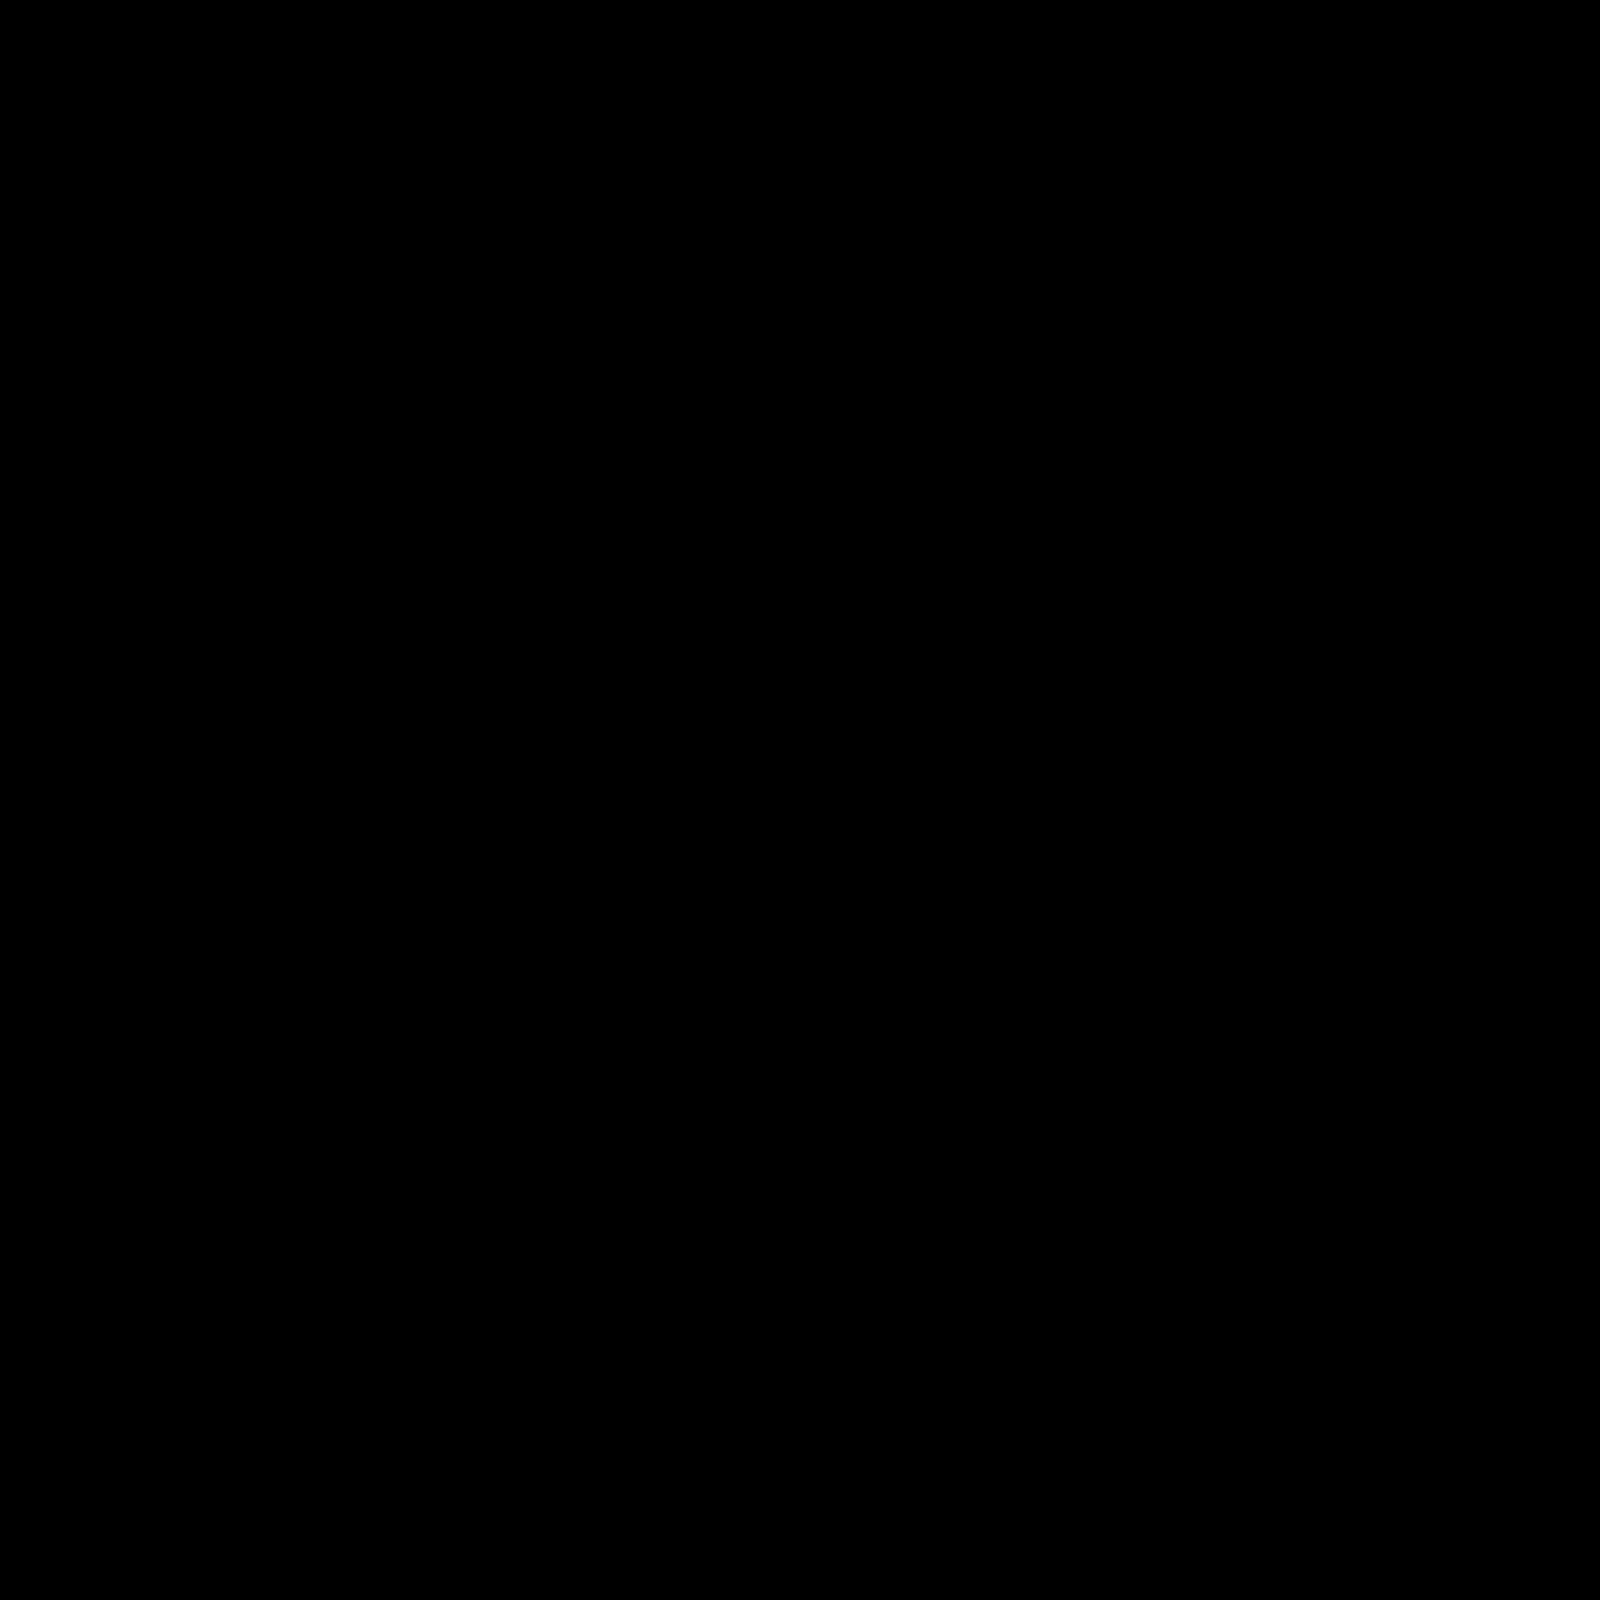 C-драйв 2 icon